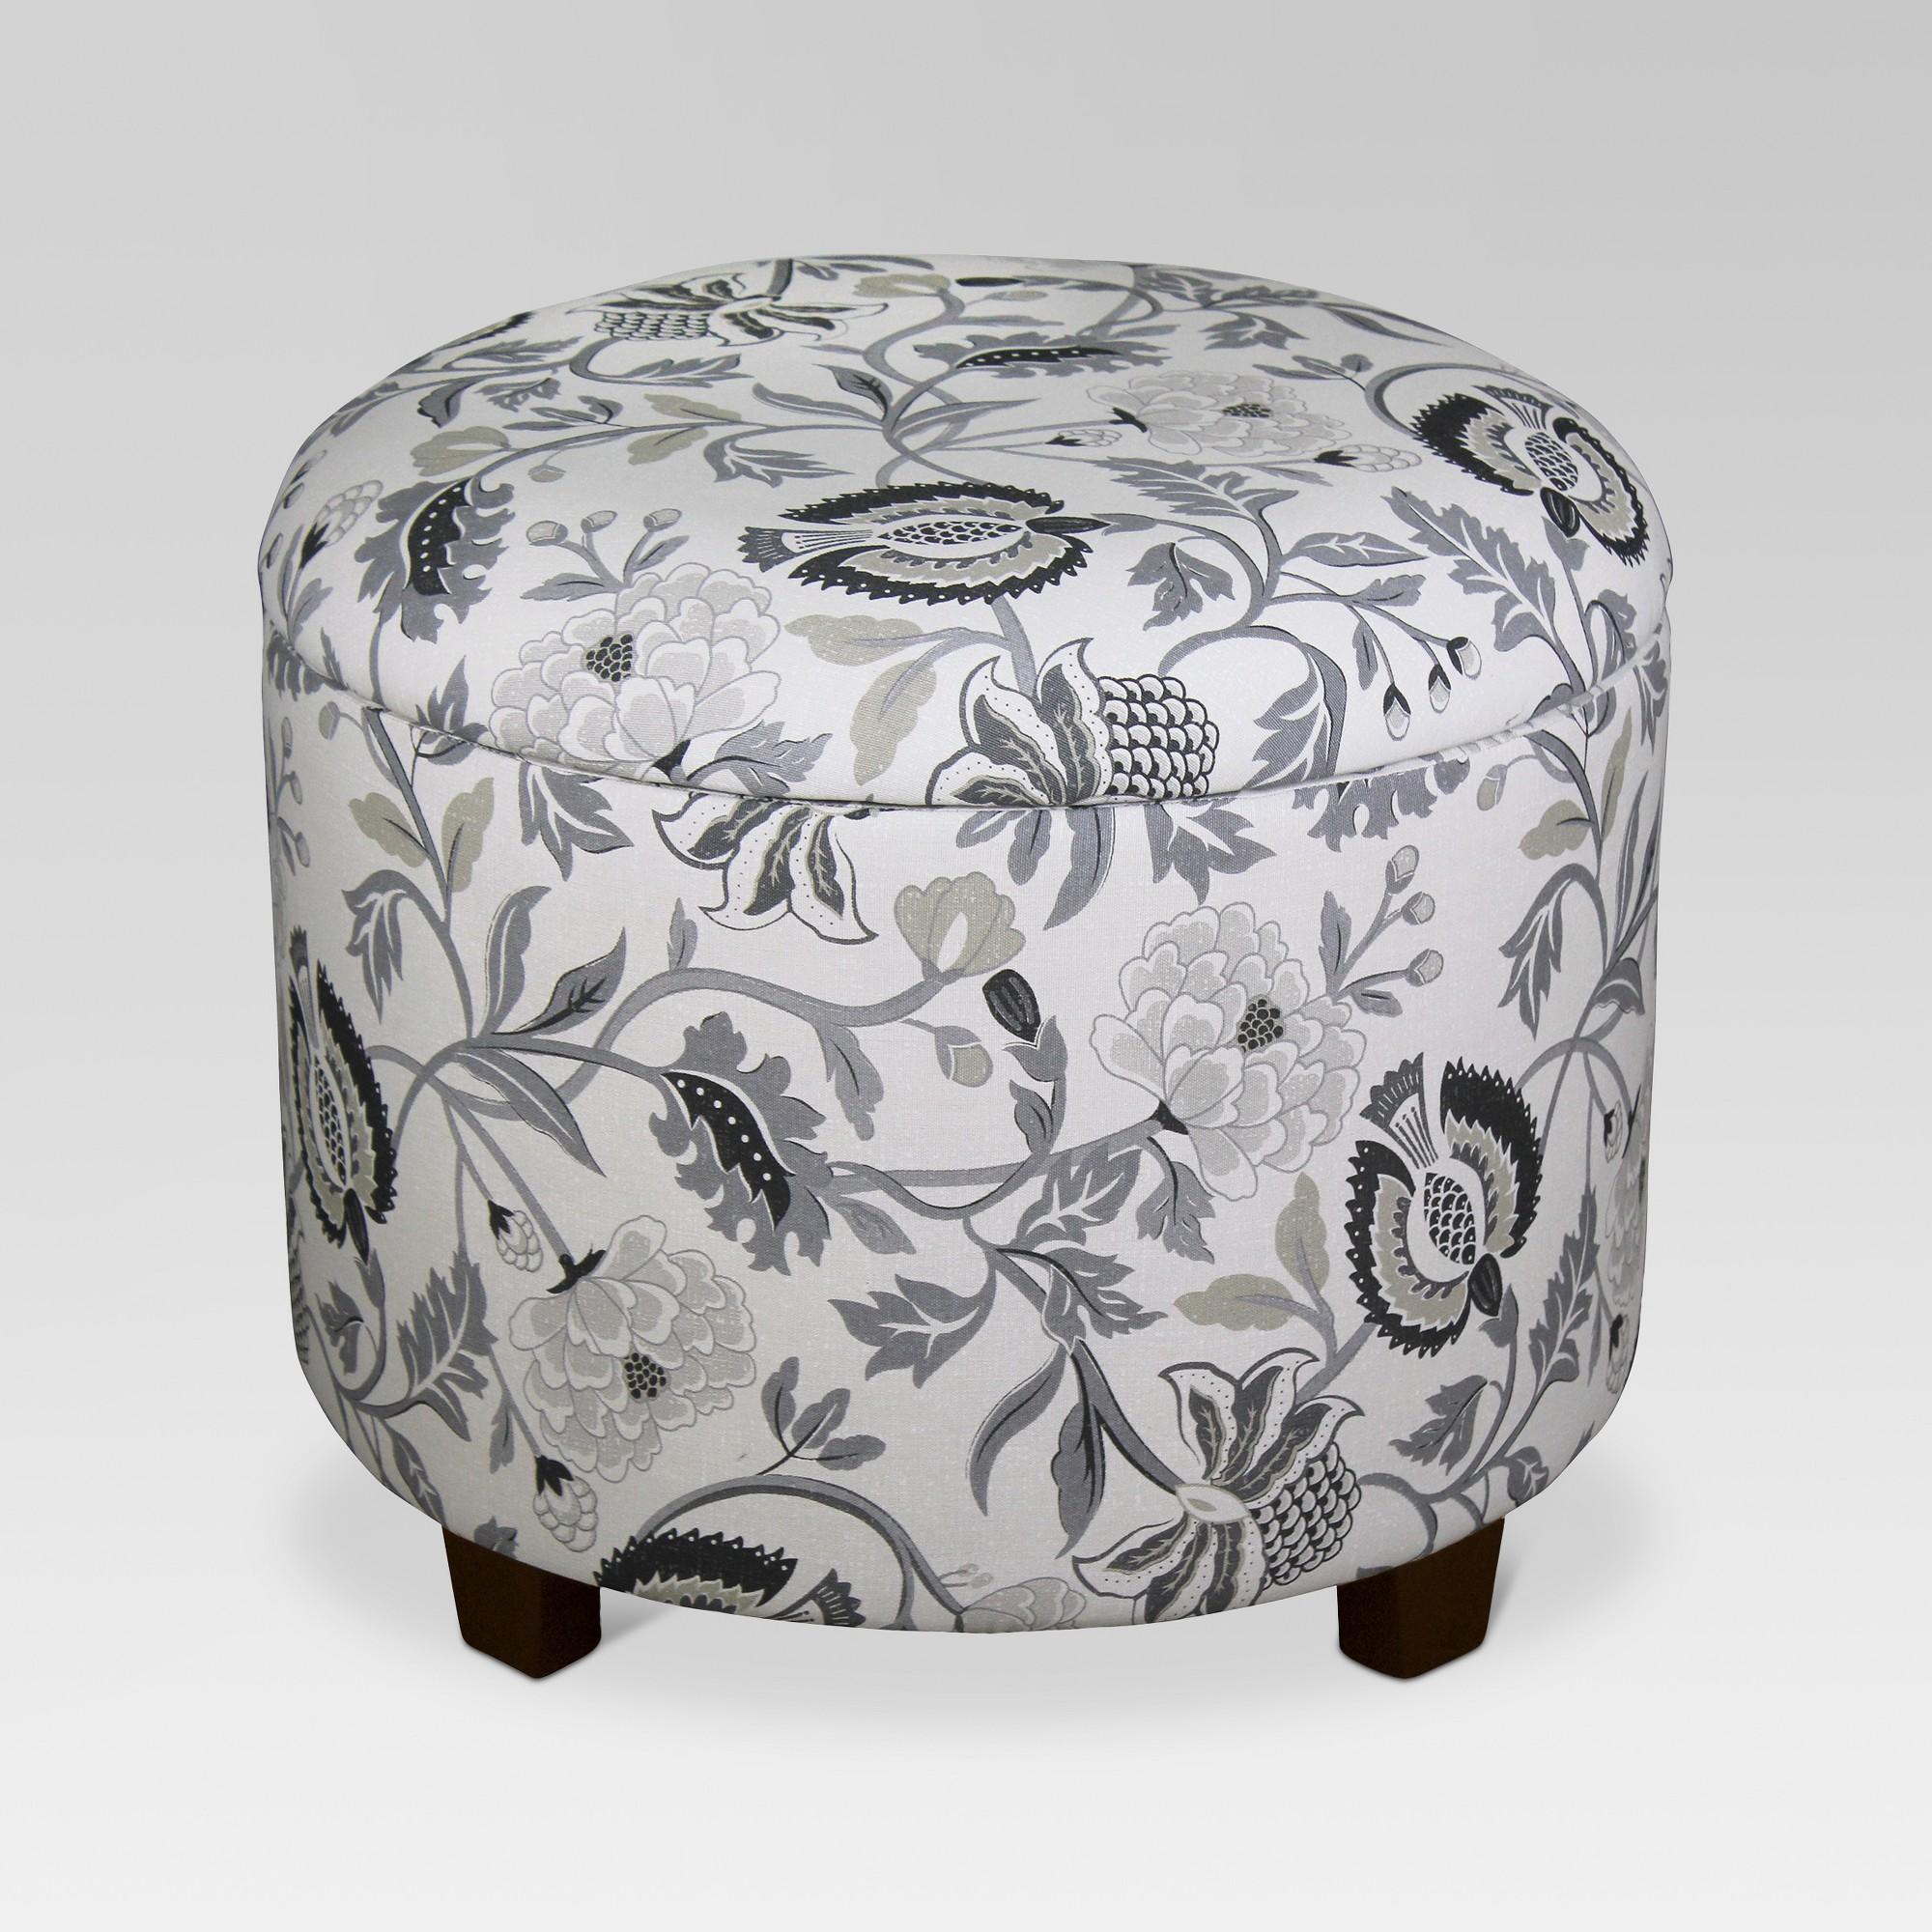 Terrific Trappe Medium Round Ottoman With Storage Gray Floral Inzonedesignstudio Interior Chair Design Inzonedesignstudiocom